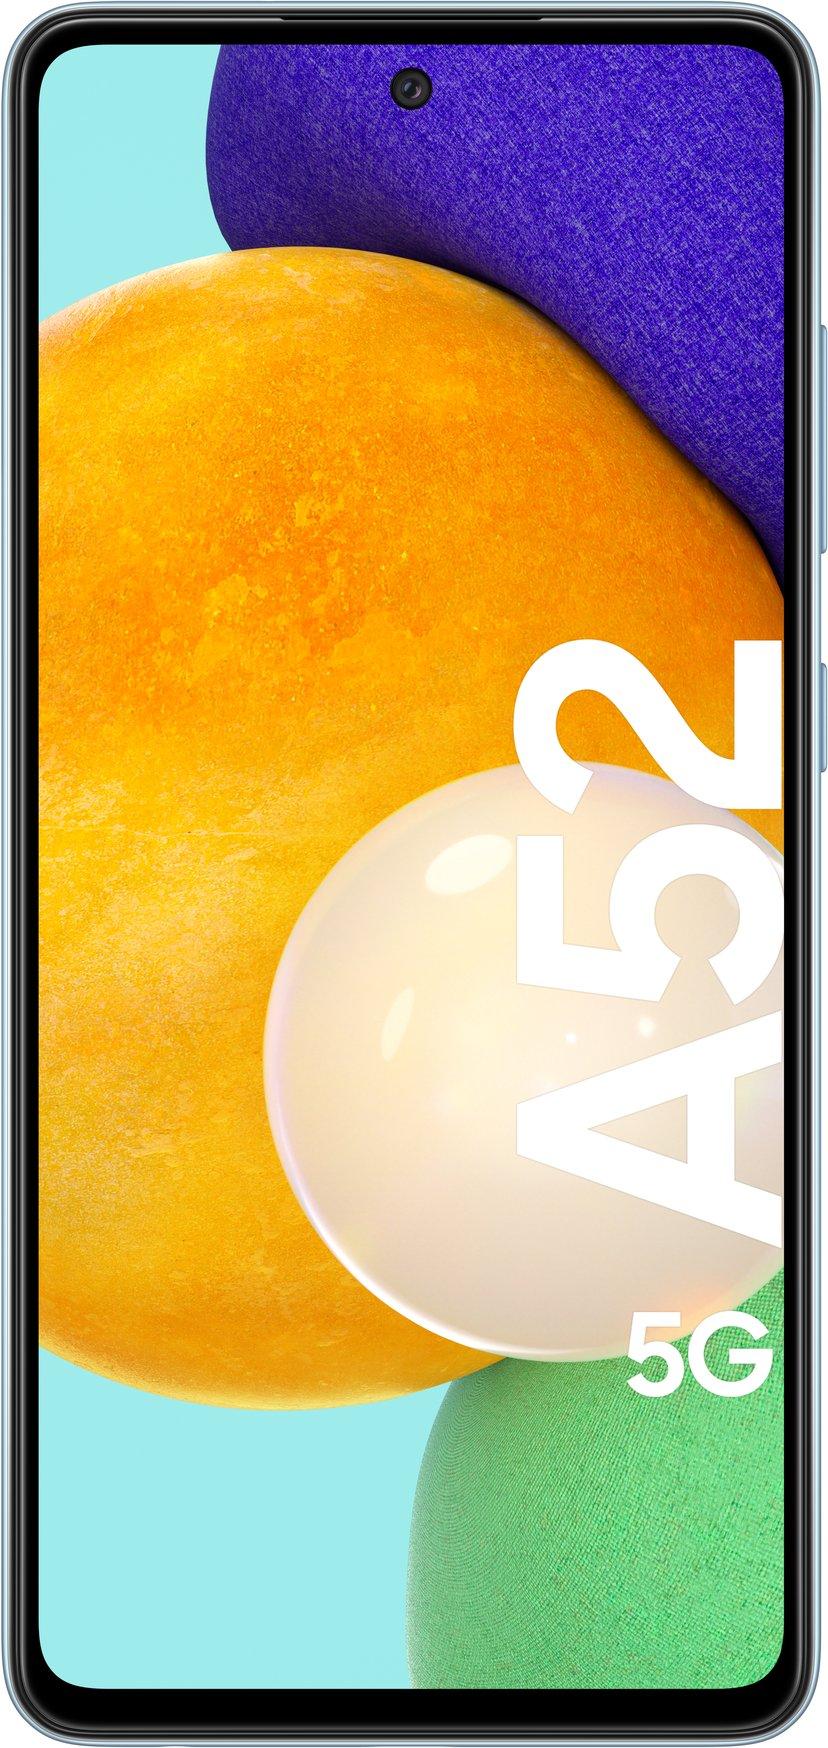 Samsung Galaxy A52 5G 128GB Dobbelt-SIM Kul blå